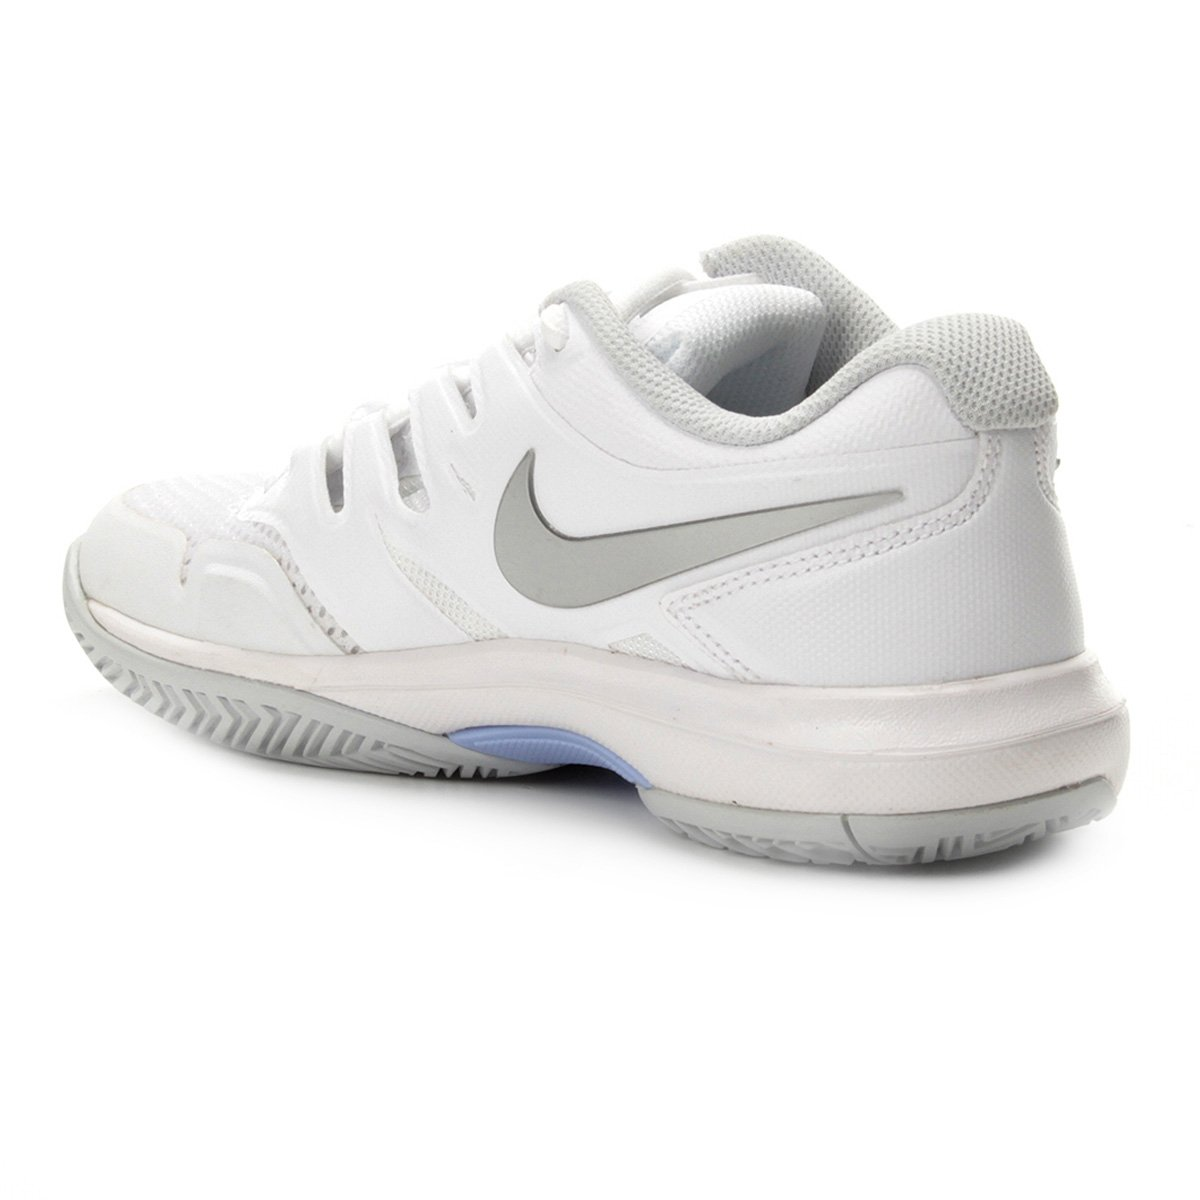 Tênis Nike Air Zoom Prestige Hc Feminino Tam 36